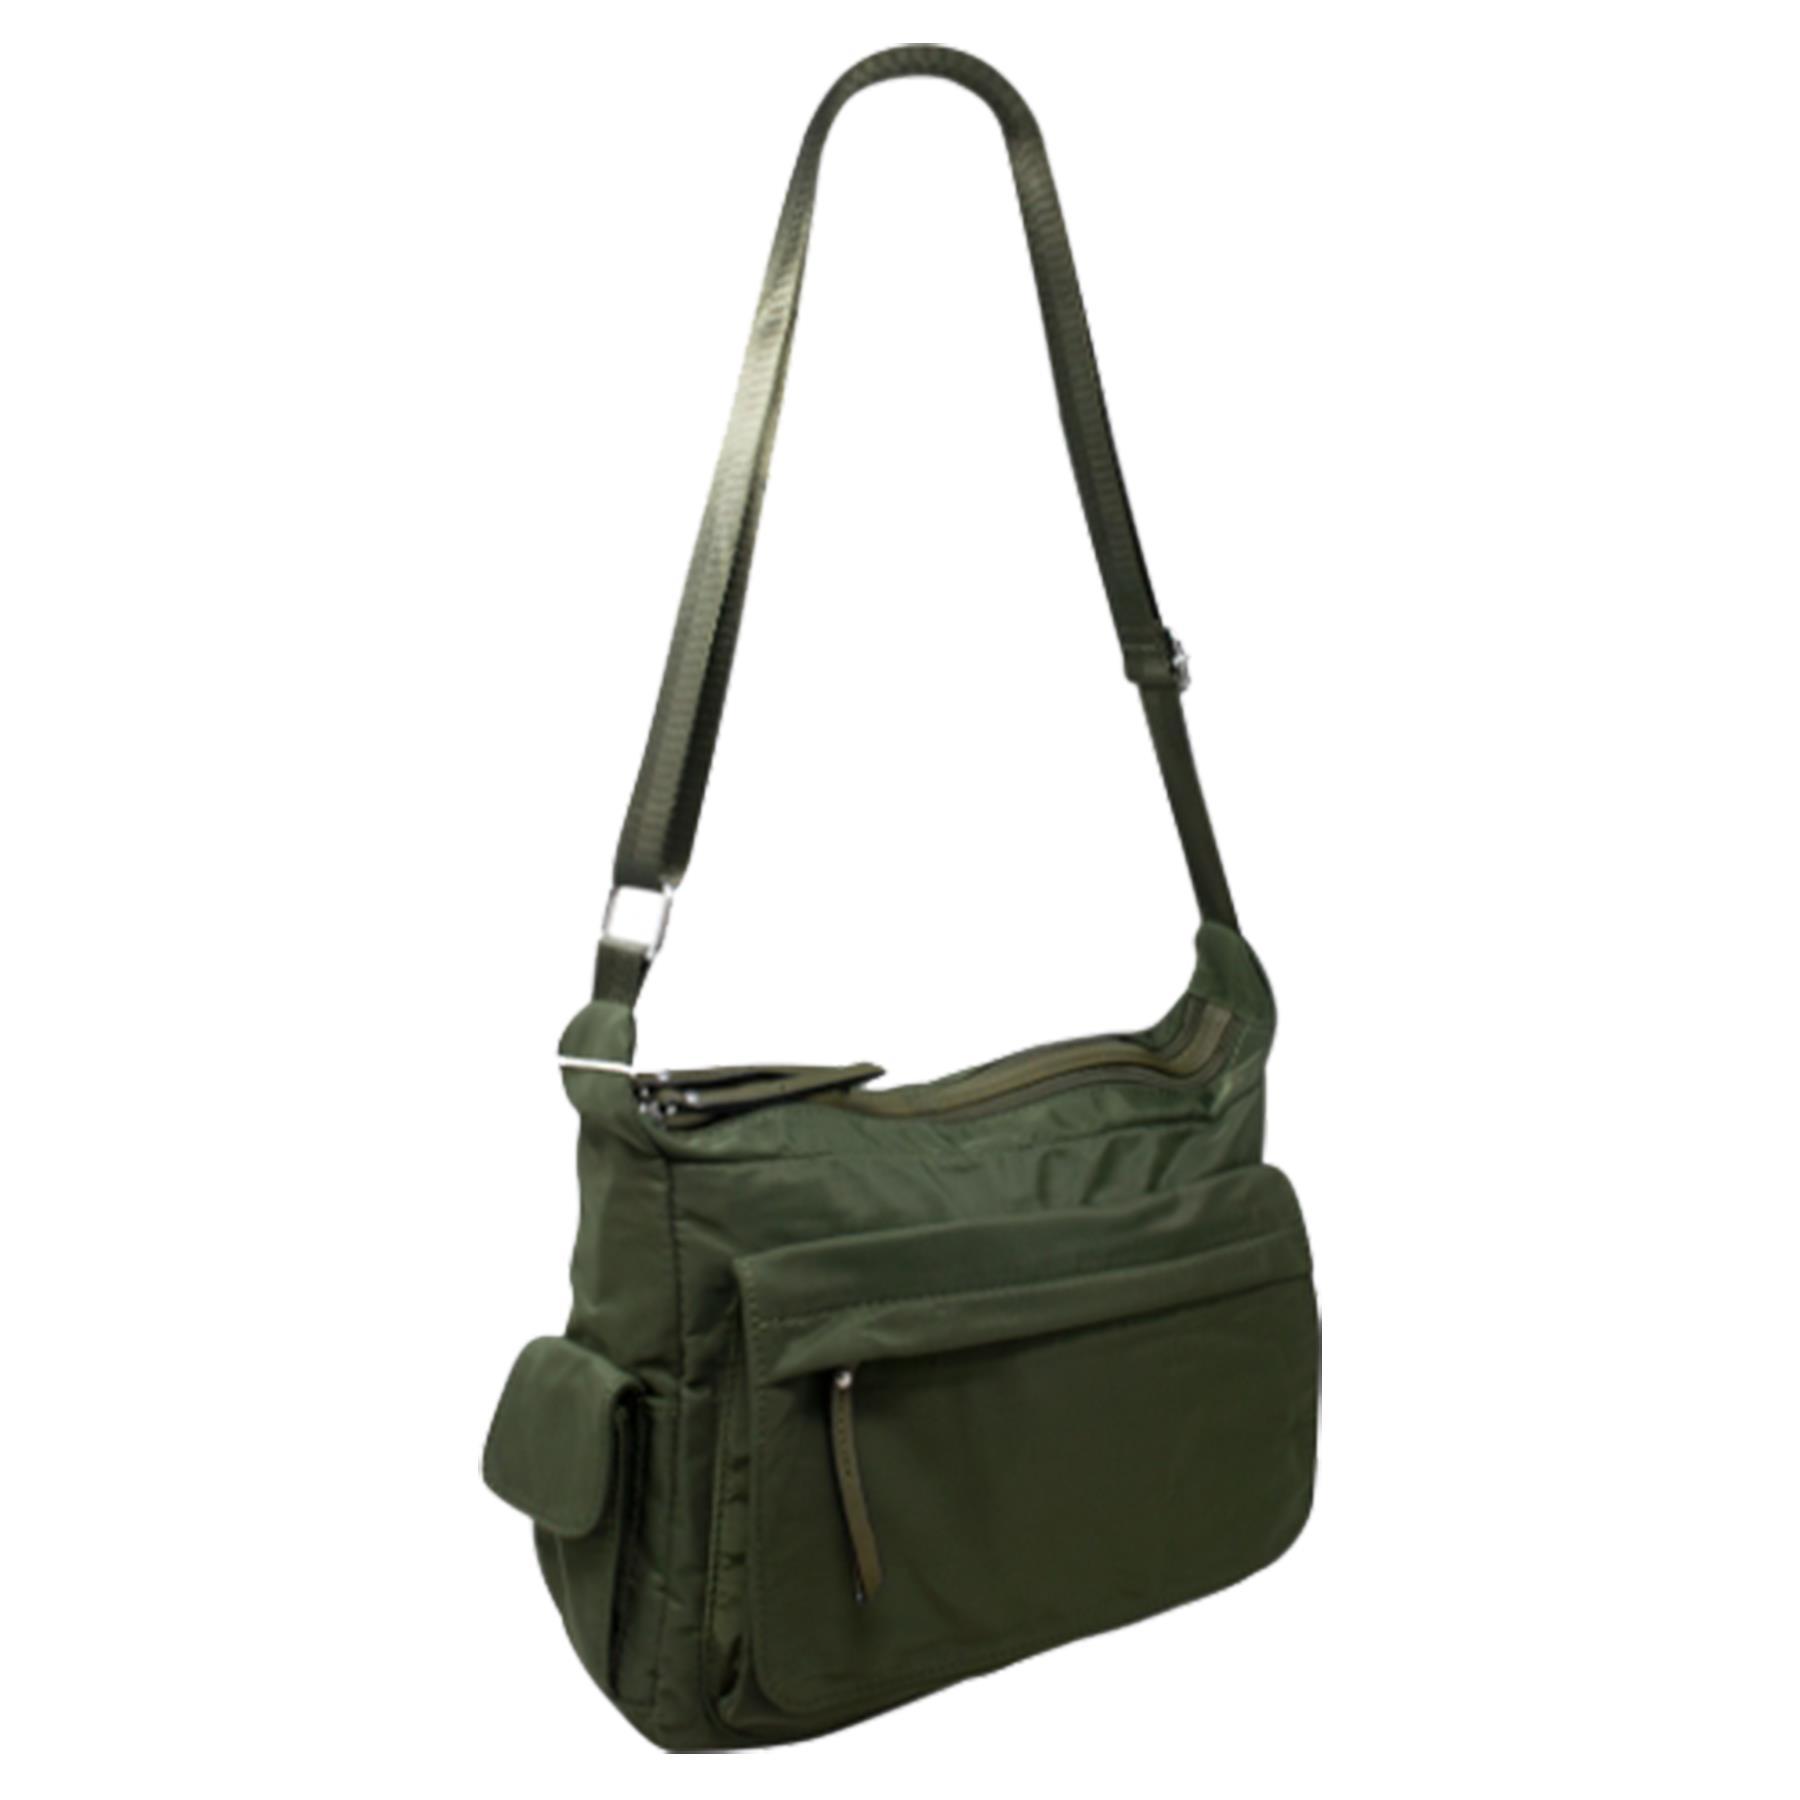 New-Ladies-Men-s-Showerproof-School-College-Practical-Basic-Crossbody-Bag thumbnail 17